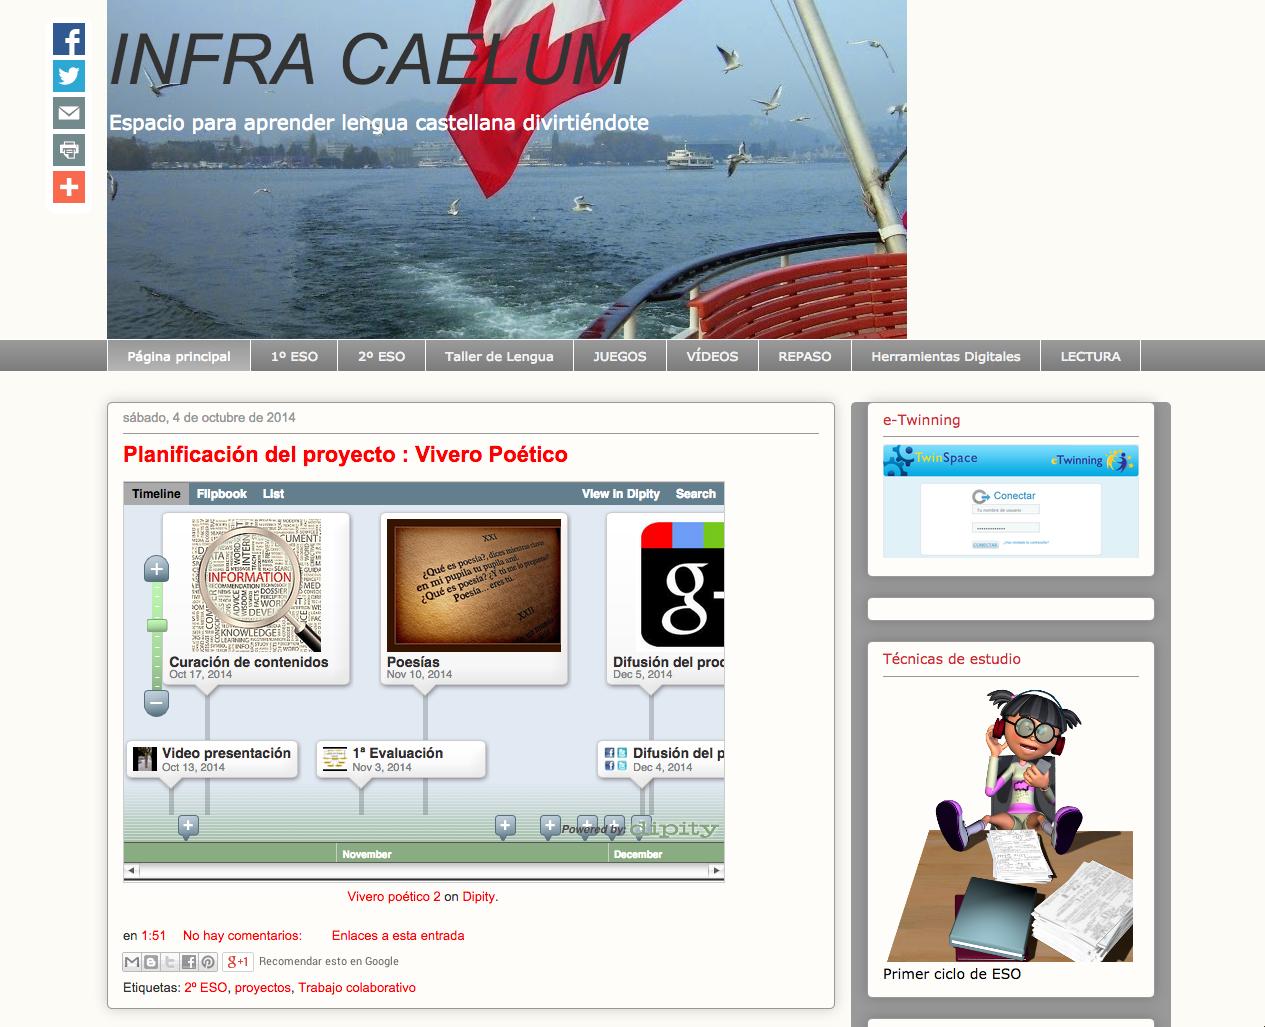 Infra caelum